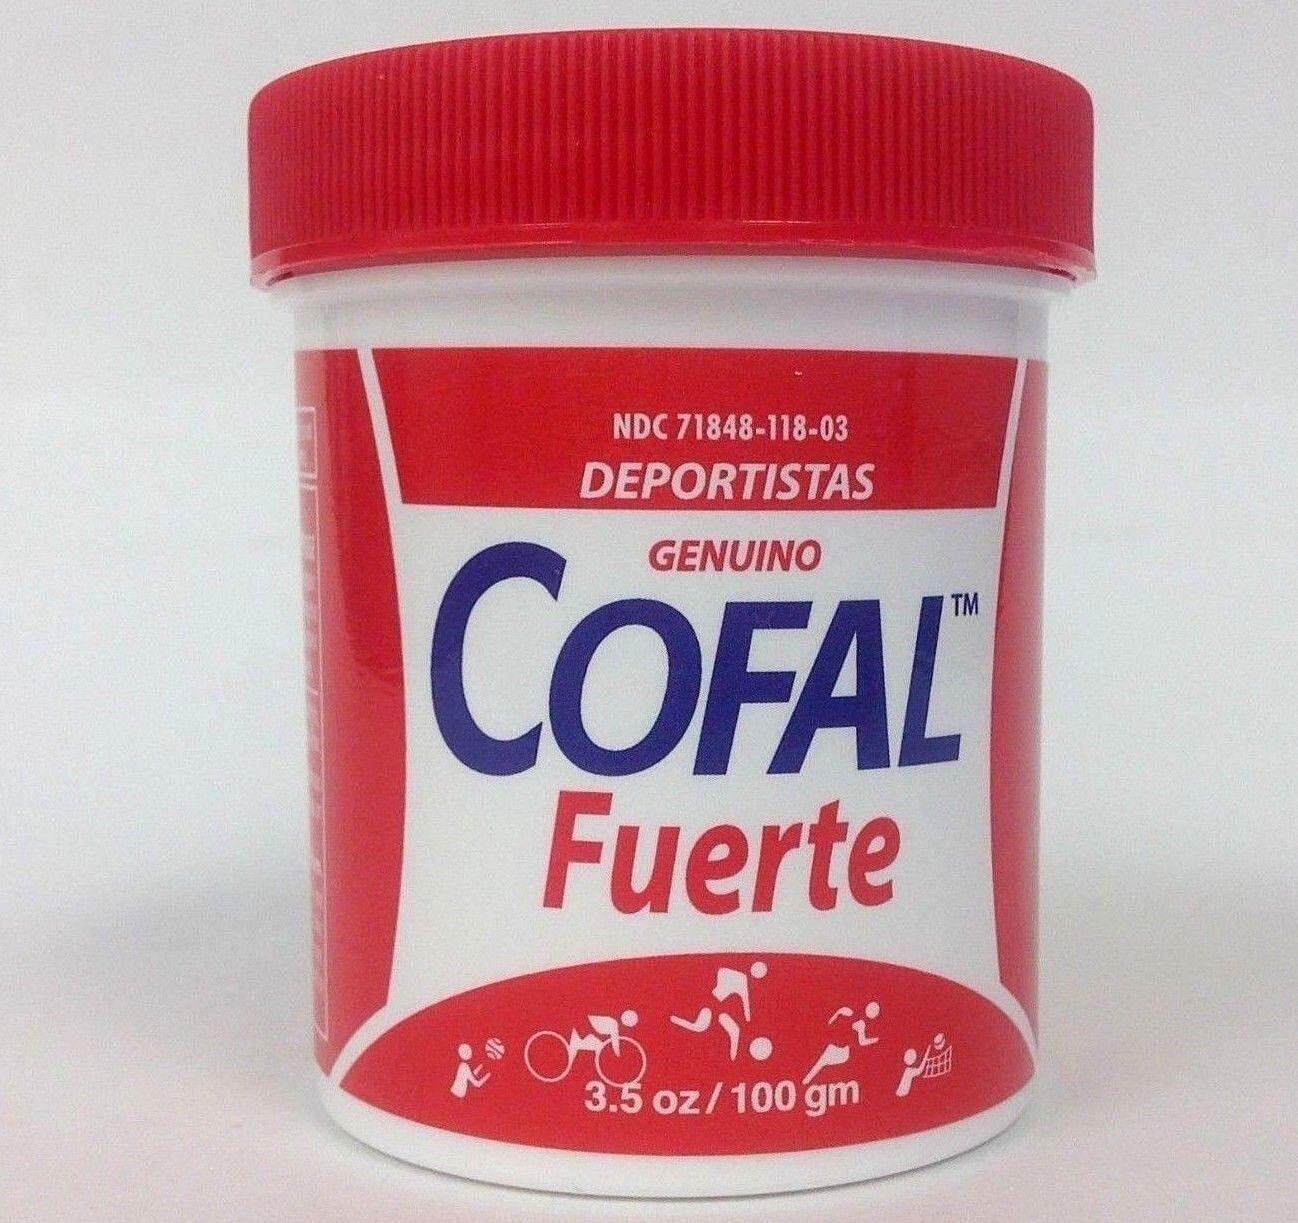 3 COFAL FUERTE ROJO 3.5oz GRANDE - FOR MUSCULAR PAIN, ARTHRITIS, BACK PAIN 1